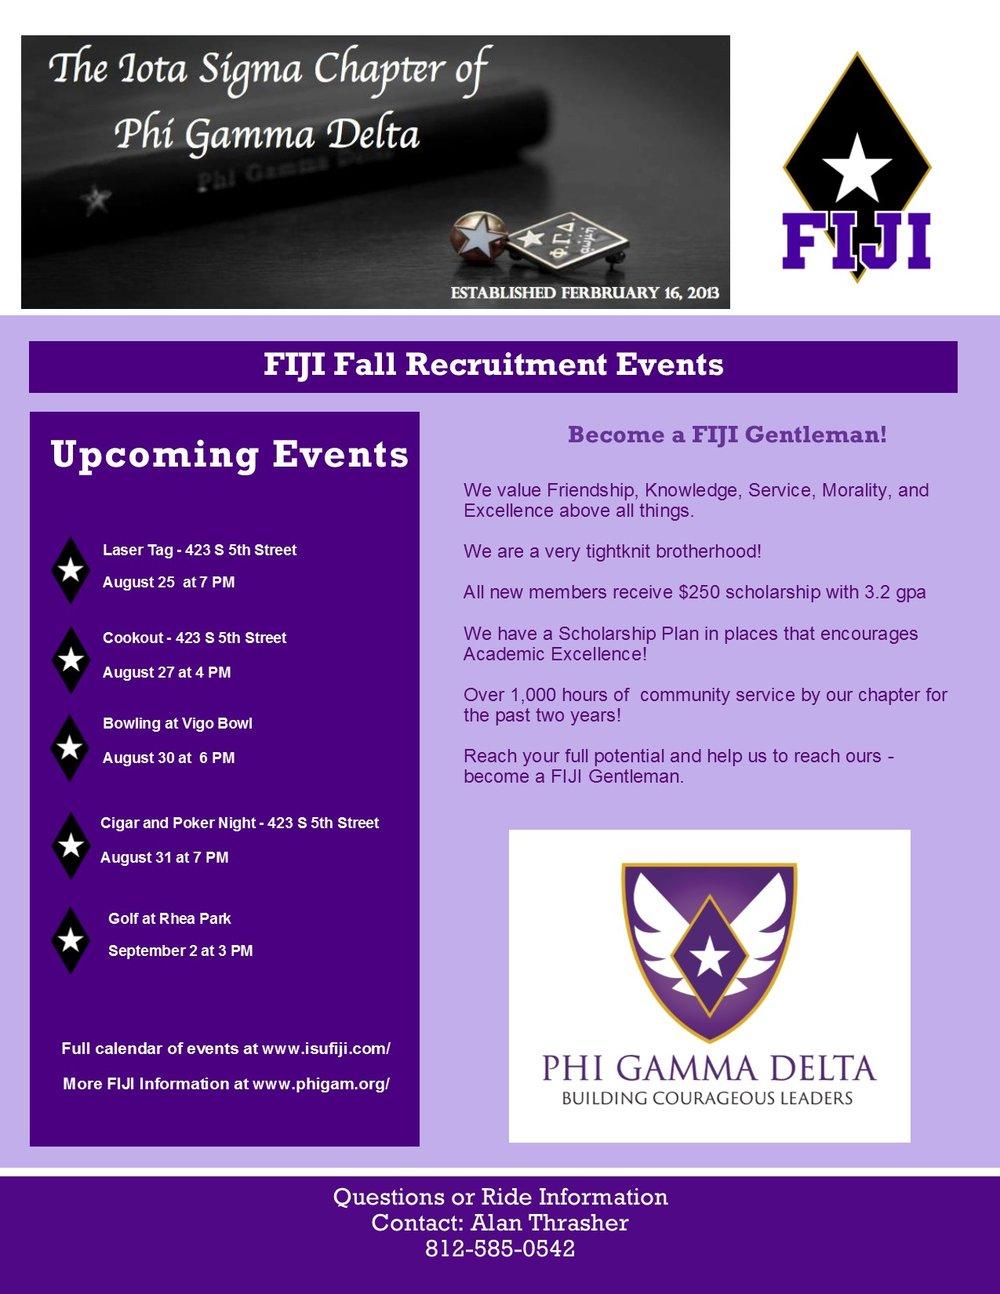 FIJI Recruitment Poster.jpg